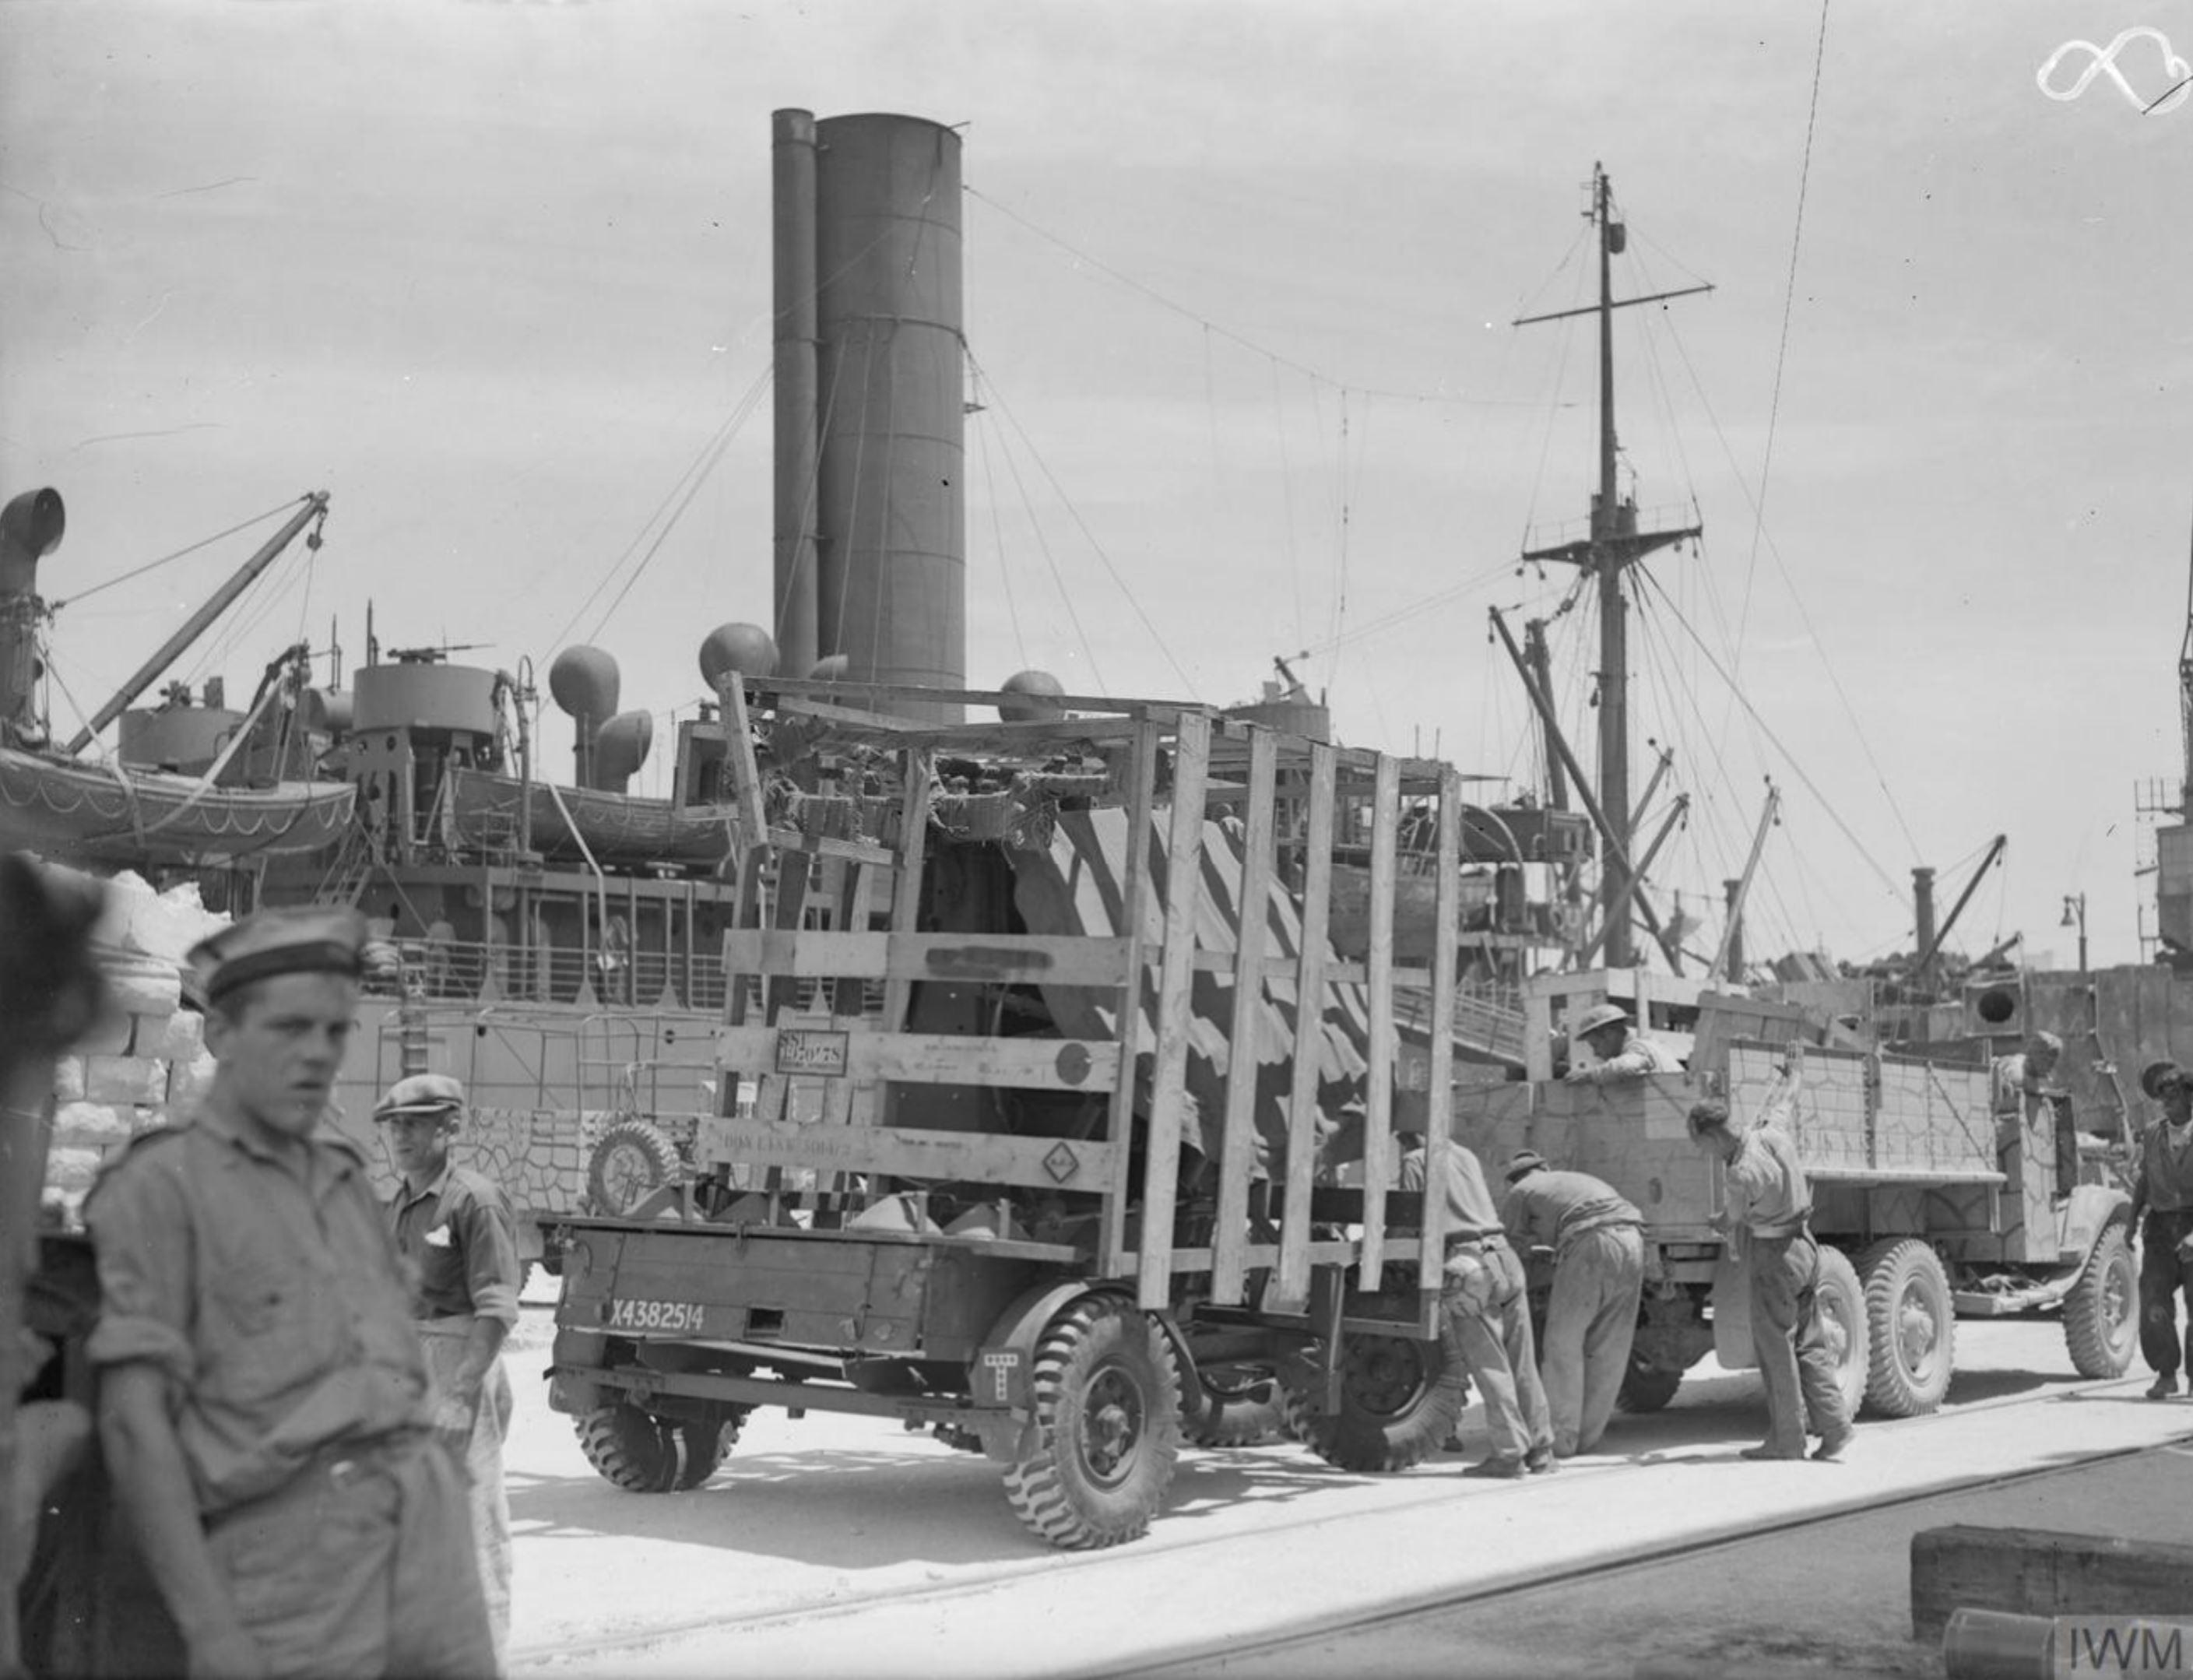 Merchant ship Troilus freight being emptied in Grand Harbour Malta 16th Jun 1942 IWM A10409